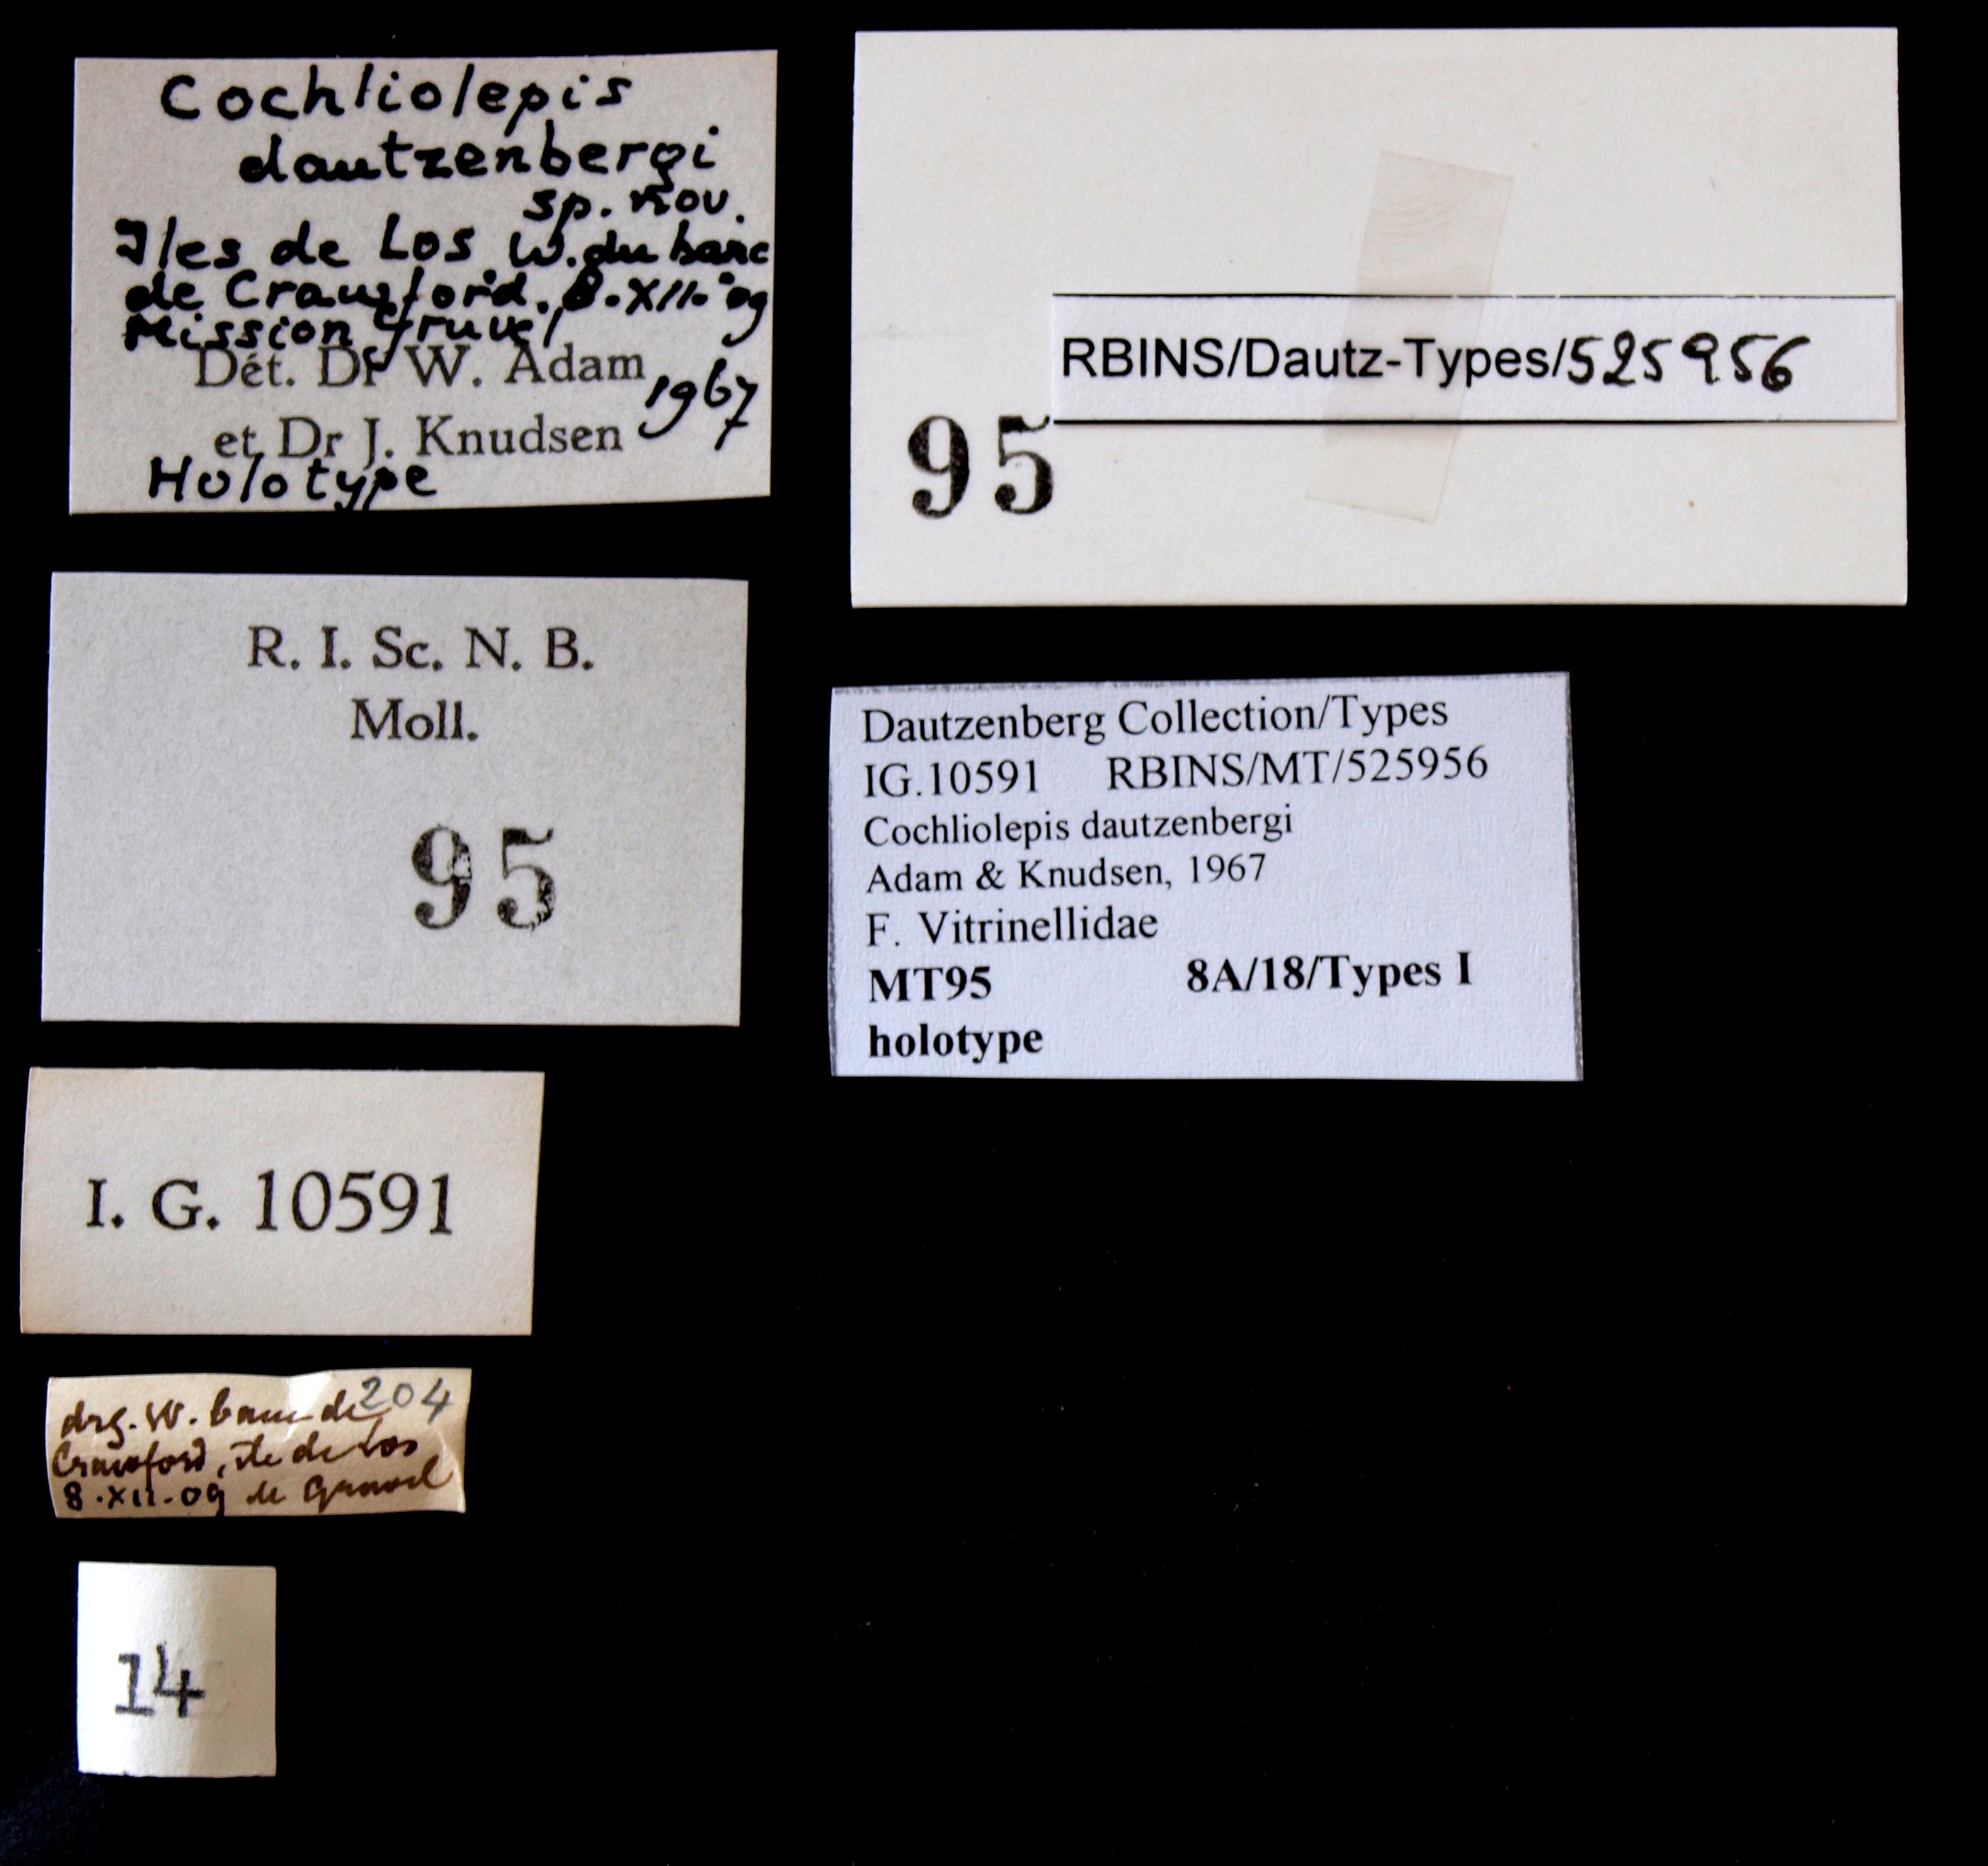 0095 Cochliolepis dautzenberghi Ht Lb.JPG